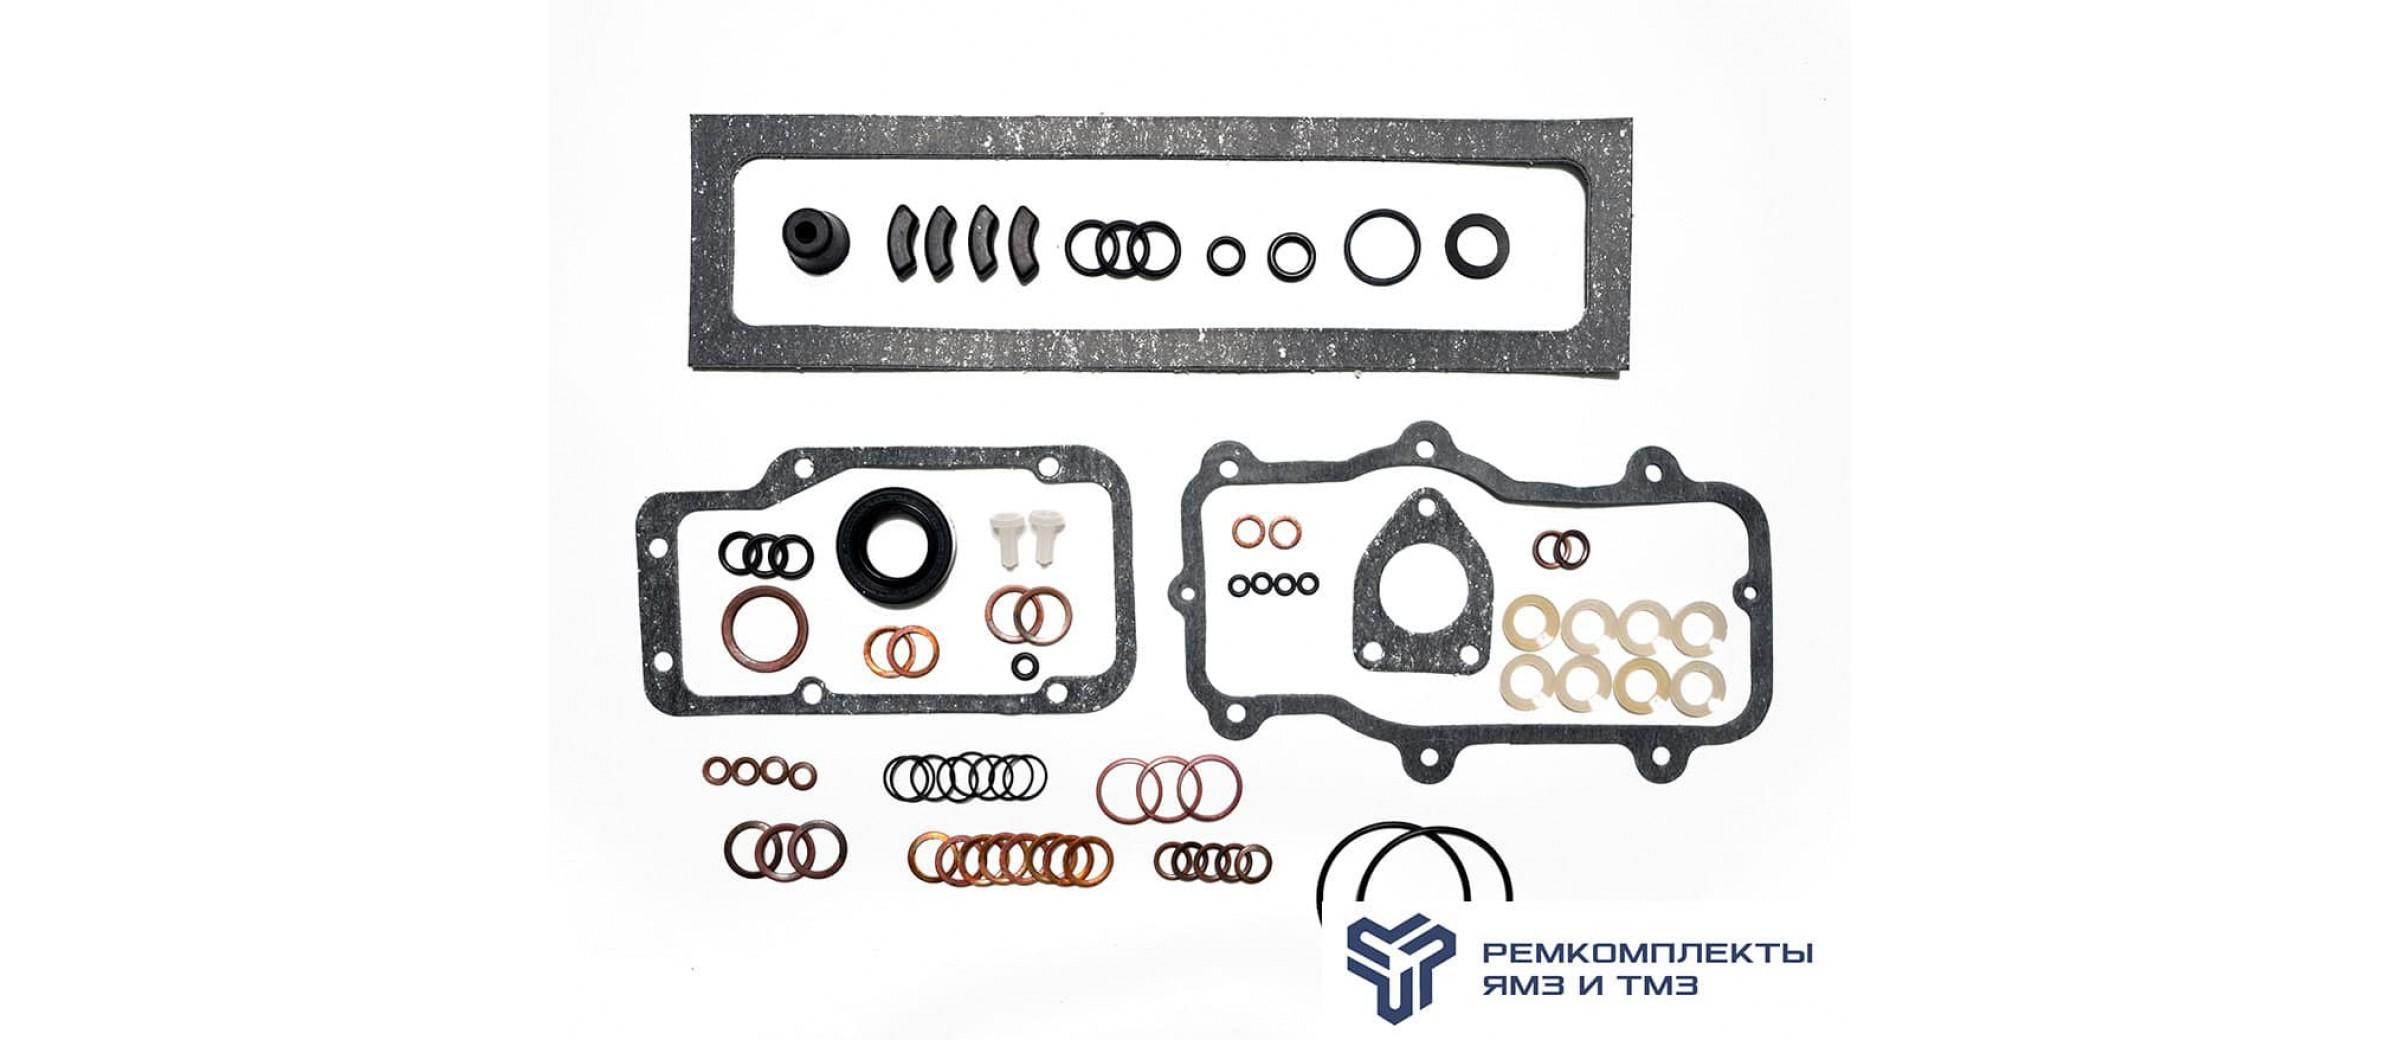 Ремкомплект ТНВД 80,808 без корректора (РТИ,паронит,медь,пластик)